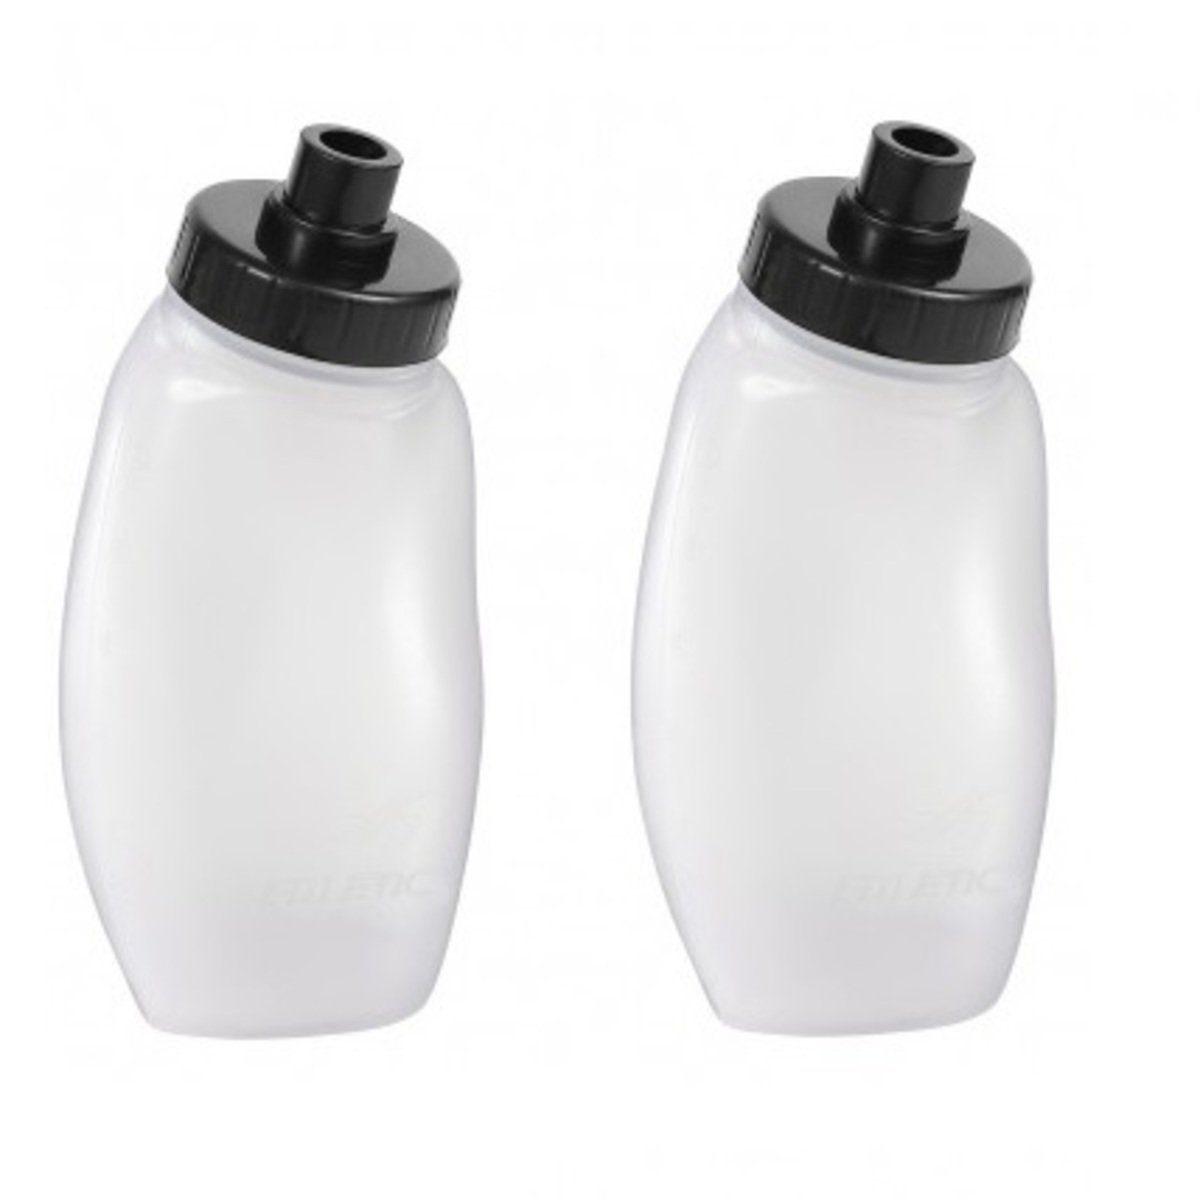 Fitletic Trinkflasche »Ersatztrinkflasche (2 x 350ml Set)«